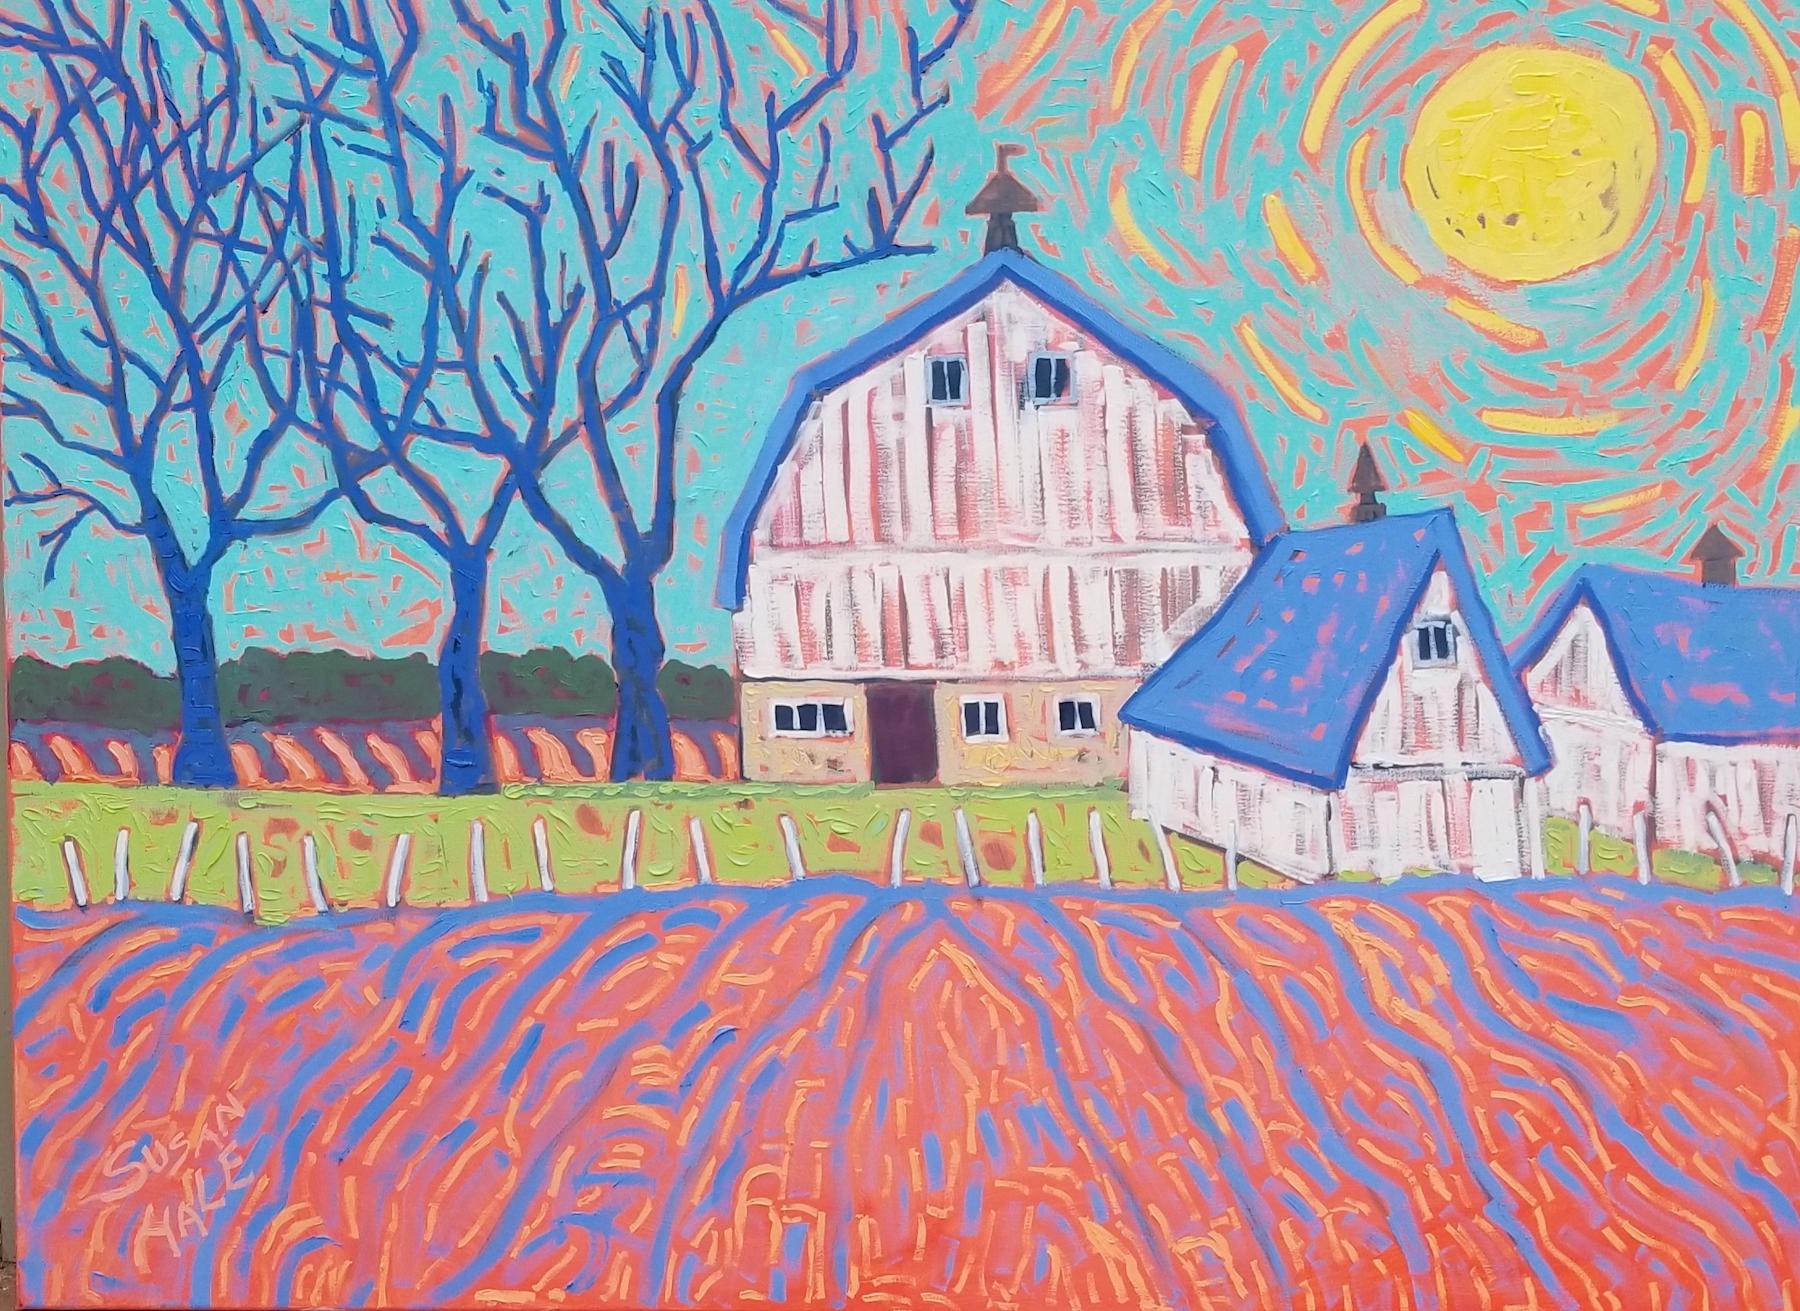 Sunburst Farm